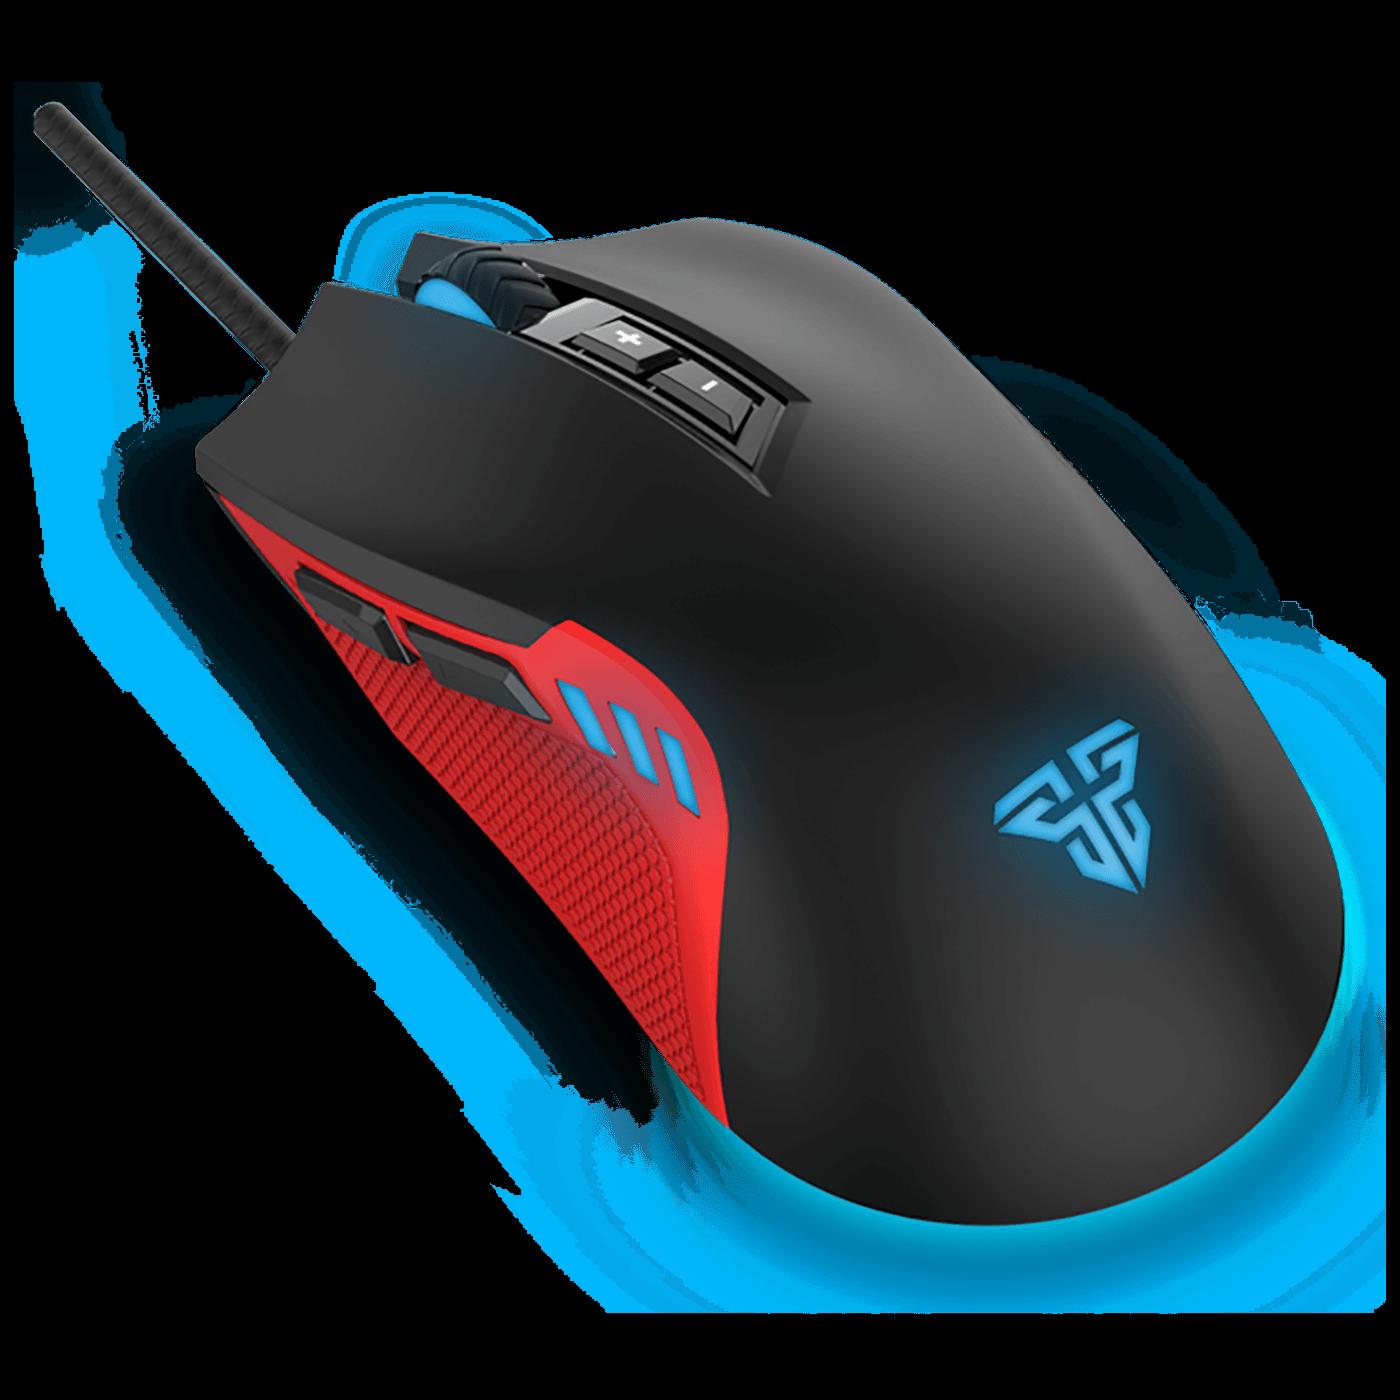 Miš optički, gaming, 4800 dpi, USB